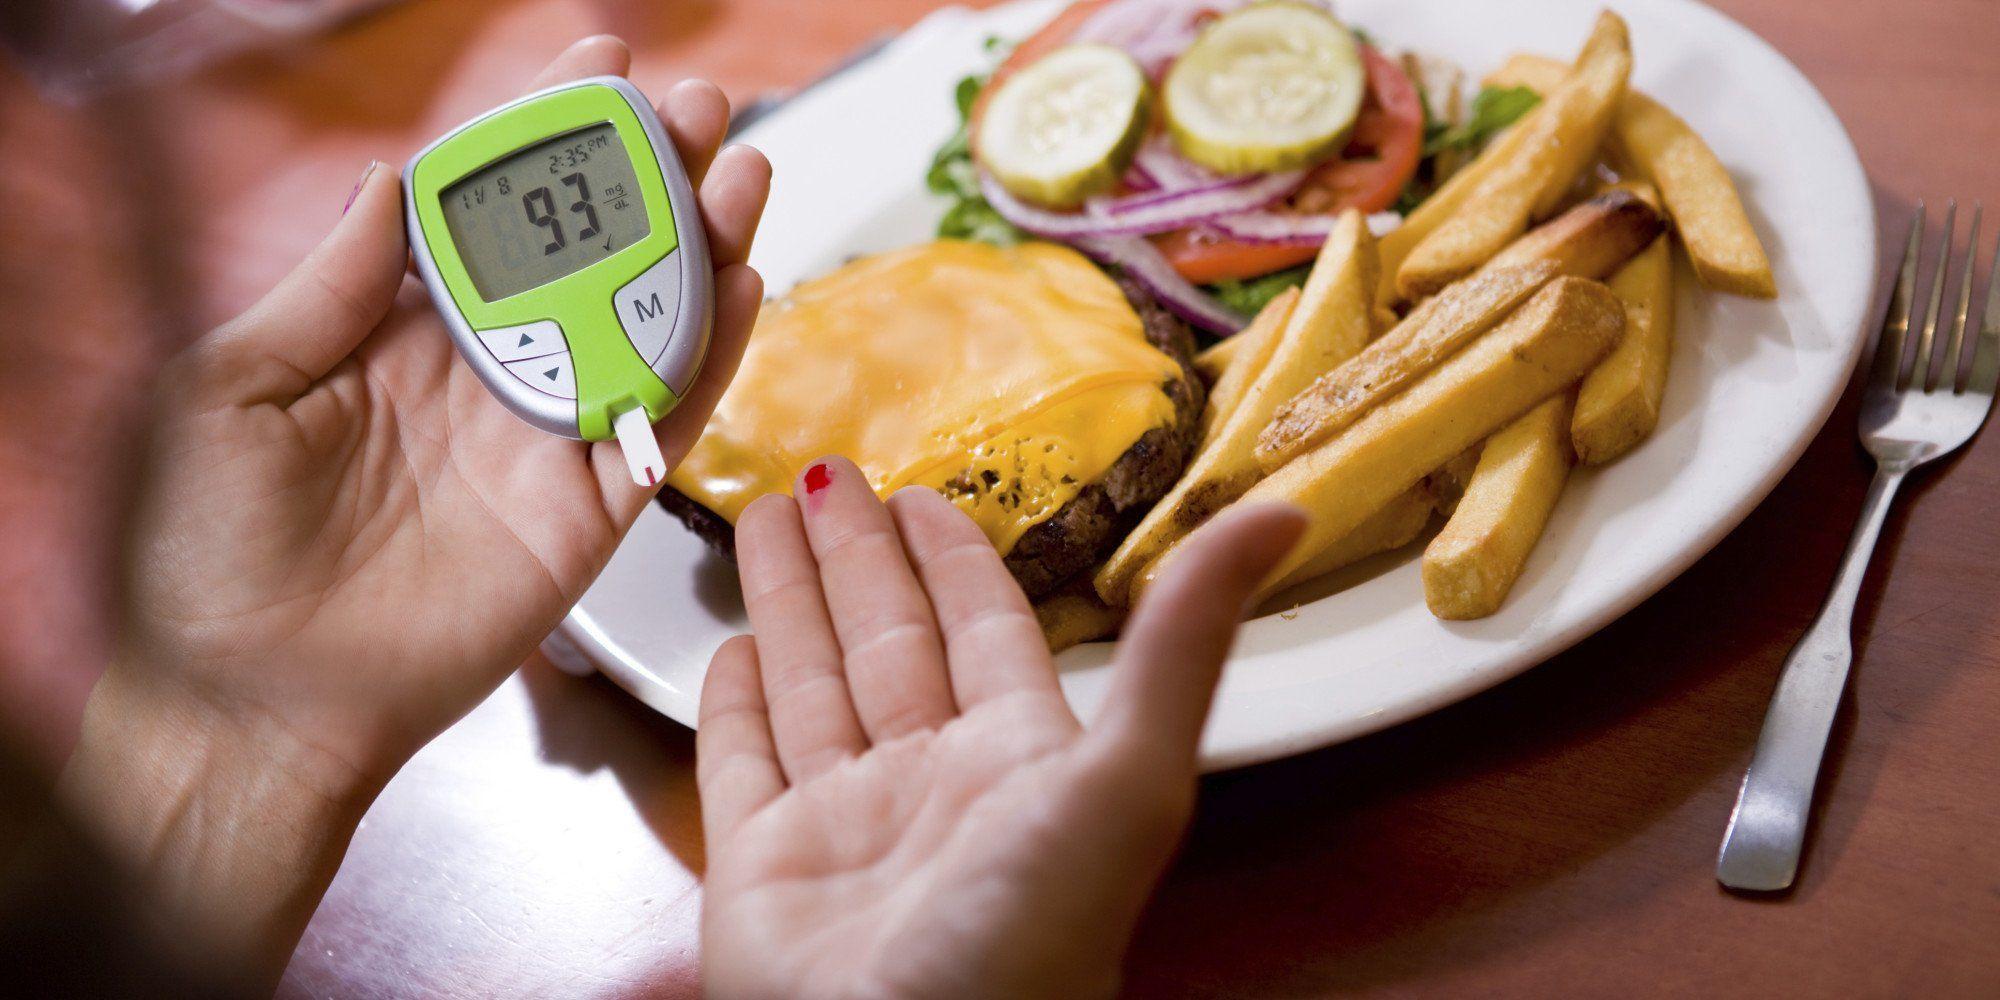 Ранний диабет первого типа сократил жизнь женщин на 18 лет